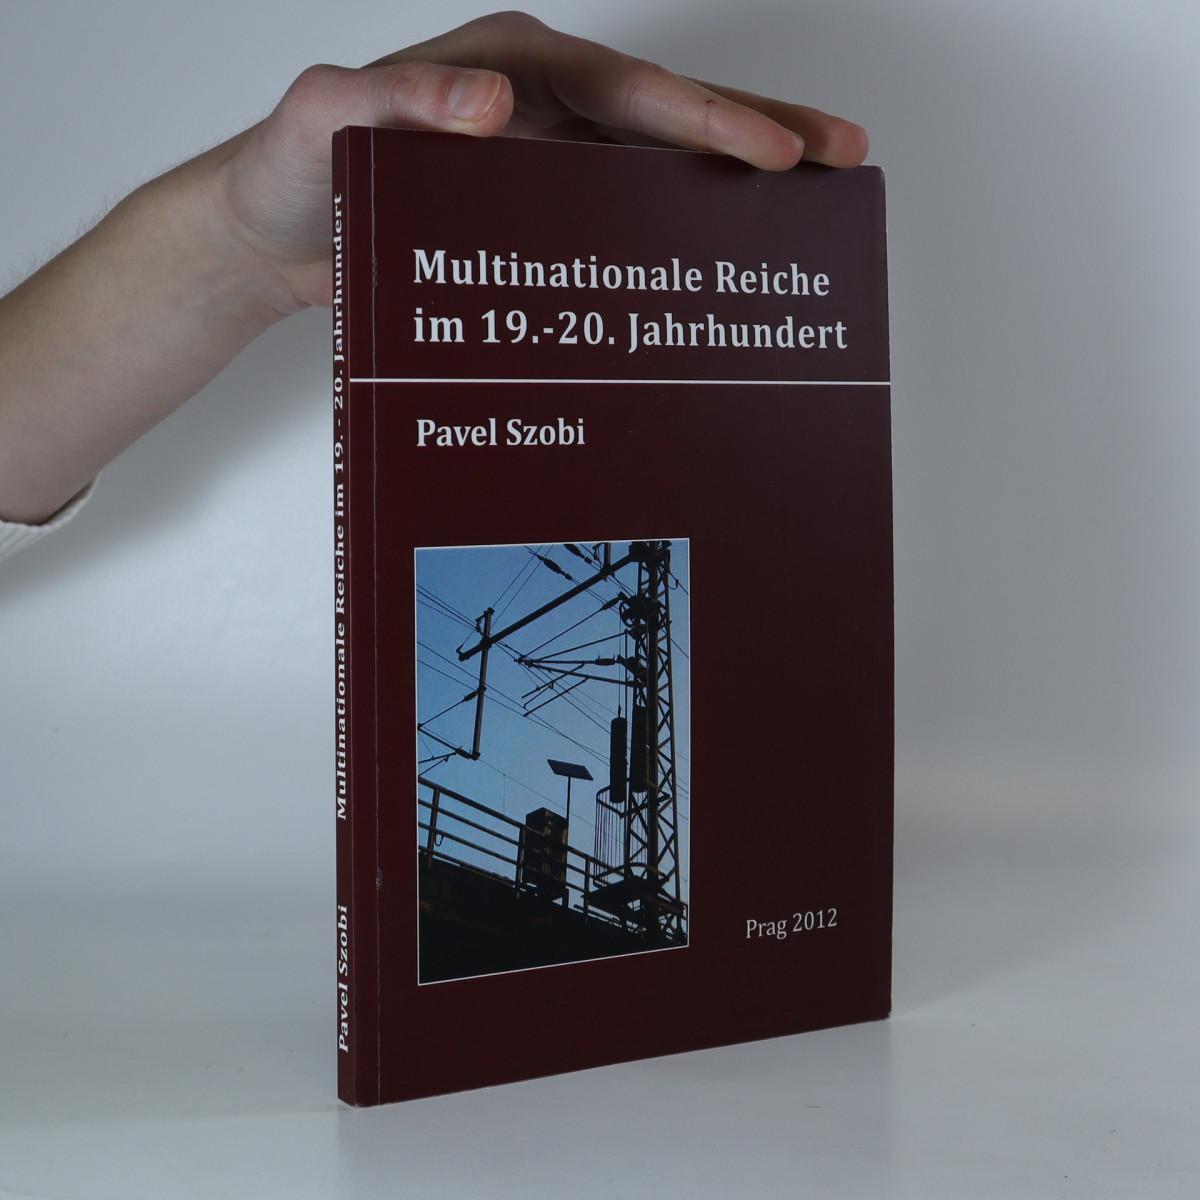 antikvární kniha Multinationale Reiche im 19.- 20. Jahrhundert., 2012